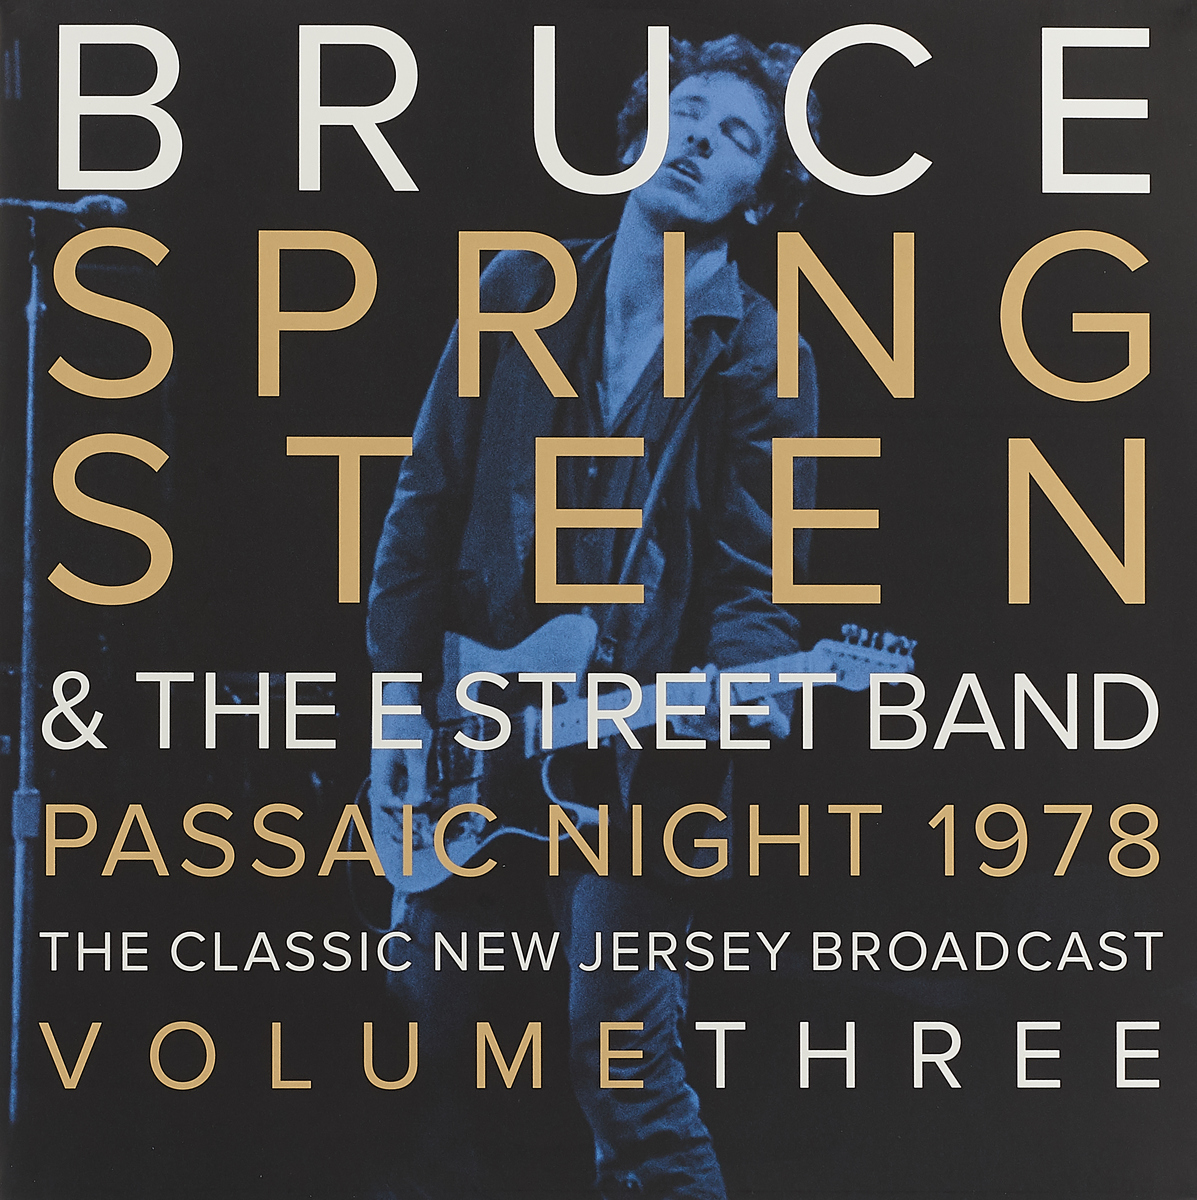 Брюс Спрингстин Bruce Springsteen. Passaic Night 1978 The Classic New Jersey Broadcast Volume Three (2 LP) george warne labaw preakness and the preakness reformed church passaic county new jersey